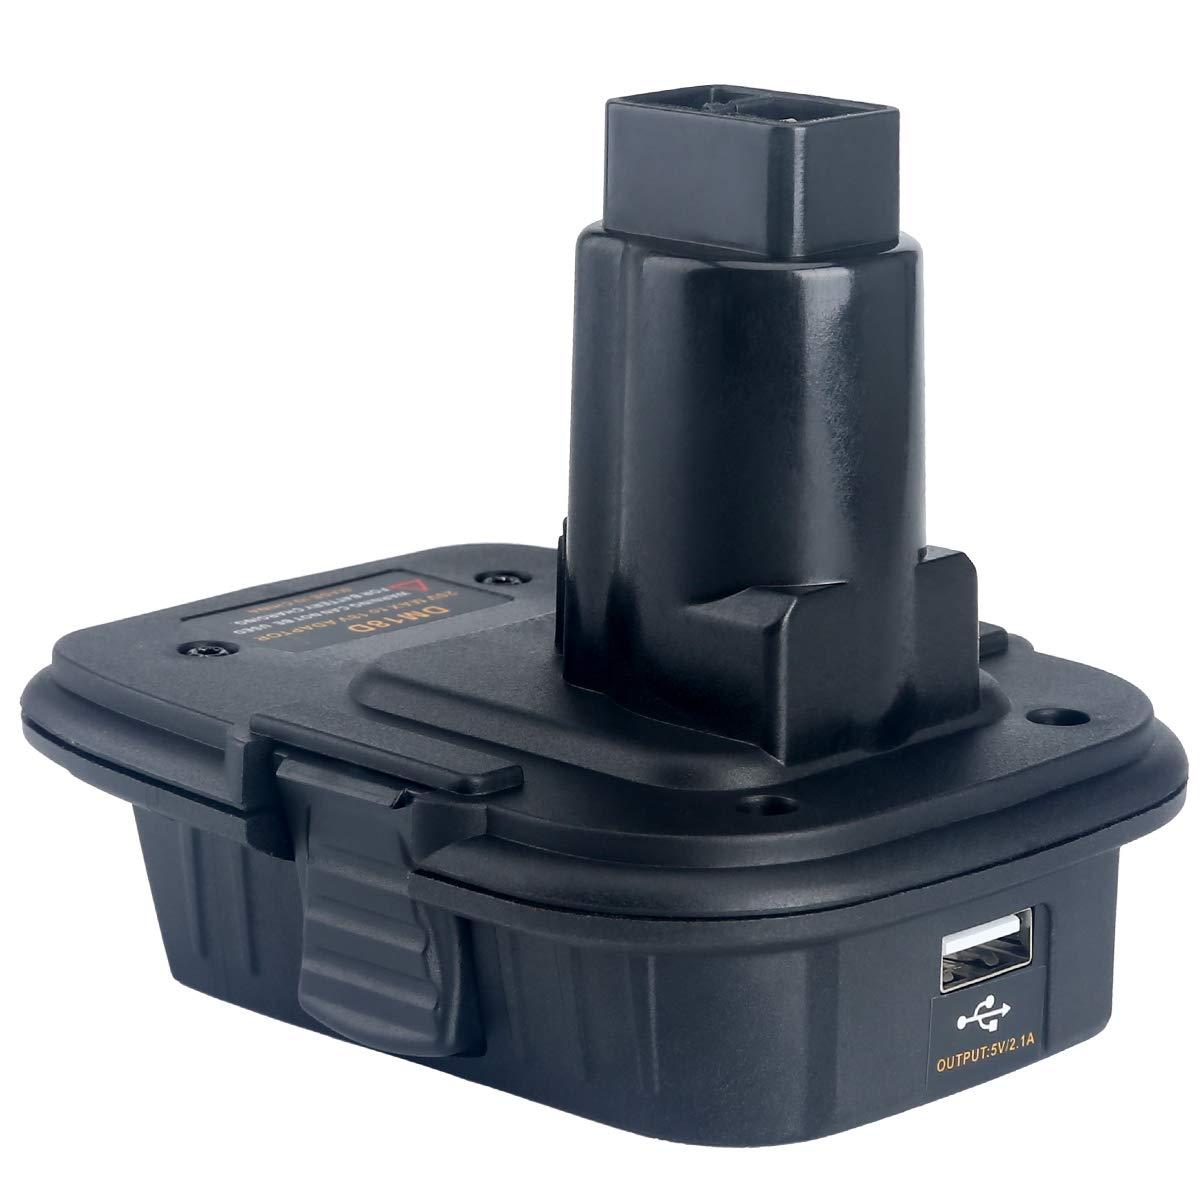 Lasica 20V Battery Adapter DCA1820 with USB port for Dewalt 18V Tools, Convert Milwaukee 18V Lithium Battery M18 DeWalt MAX 20Volt Lithium-Ion Battery DCB204 to DeWalt 18V NiCad NiMh Battery DC9096 by Lasica (Image #9)